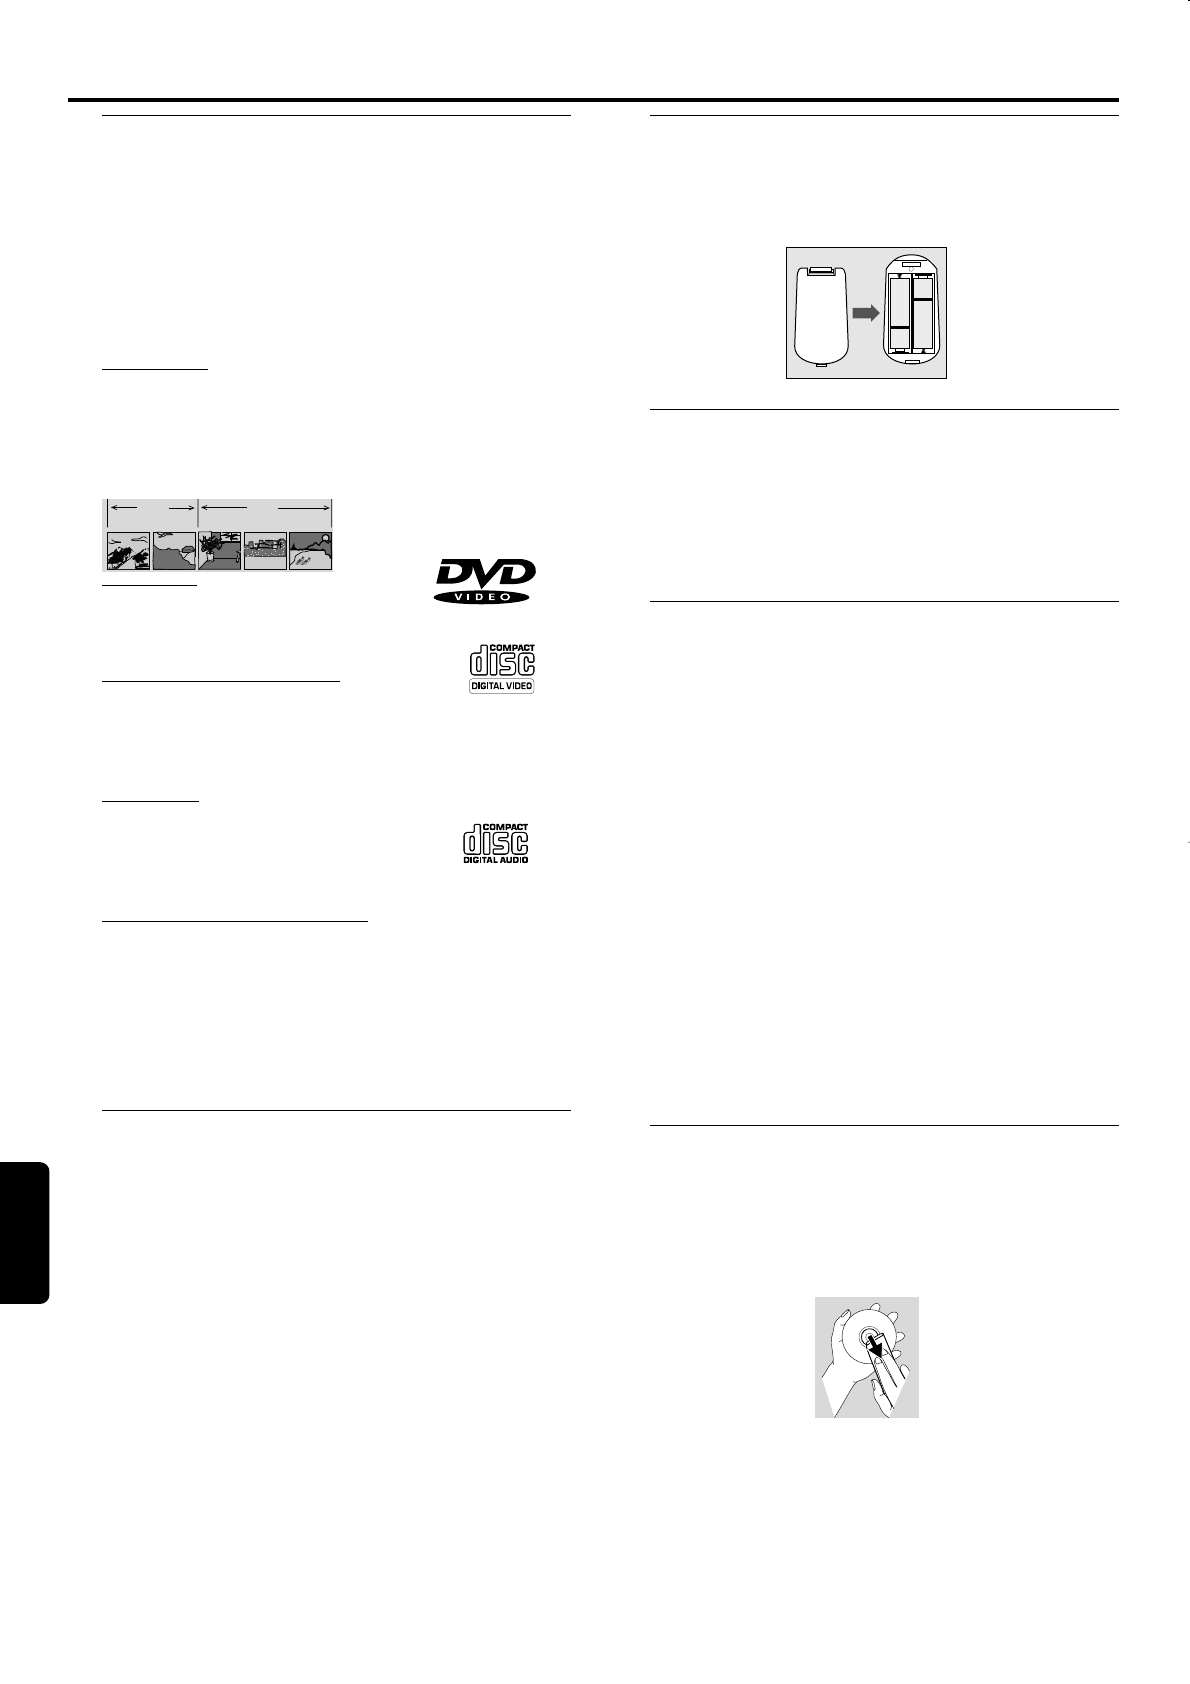 Philips Spis TreÅ ci Dvd952 021 Dfu Pol